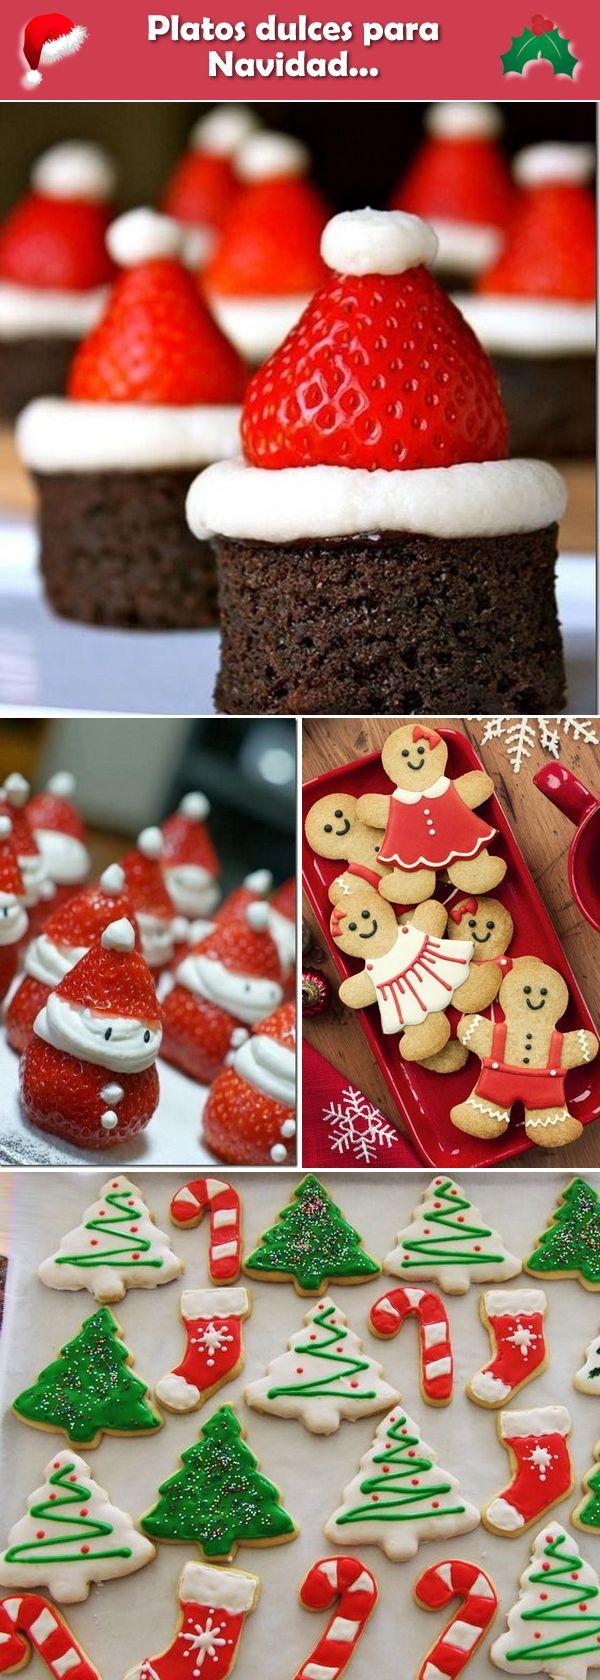 Platos dulces para Navidad. Platos navideños. Postres navideños. Ideas para postres navideños.